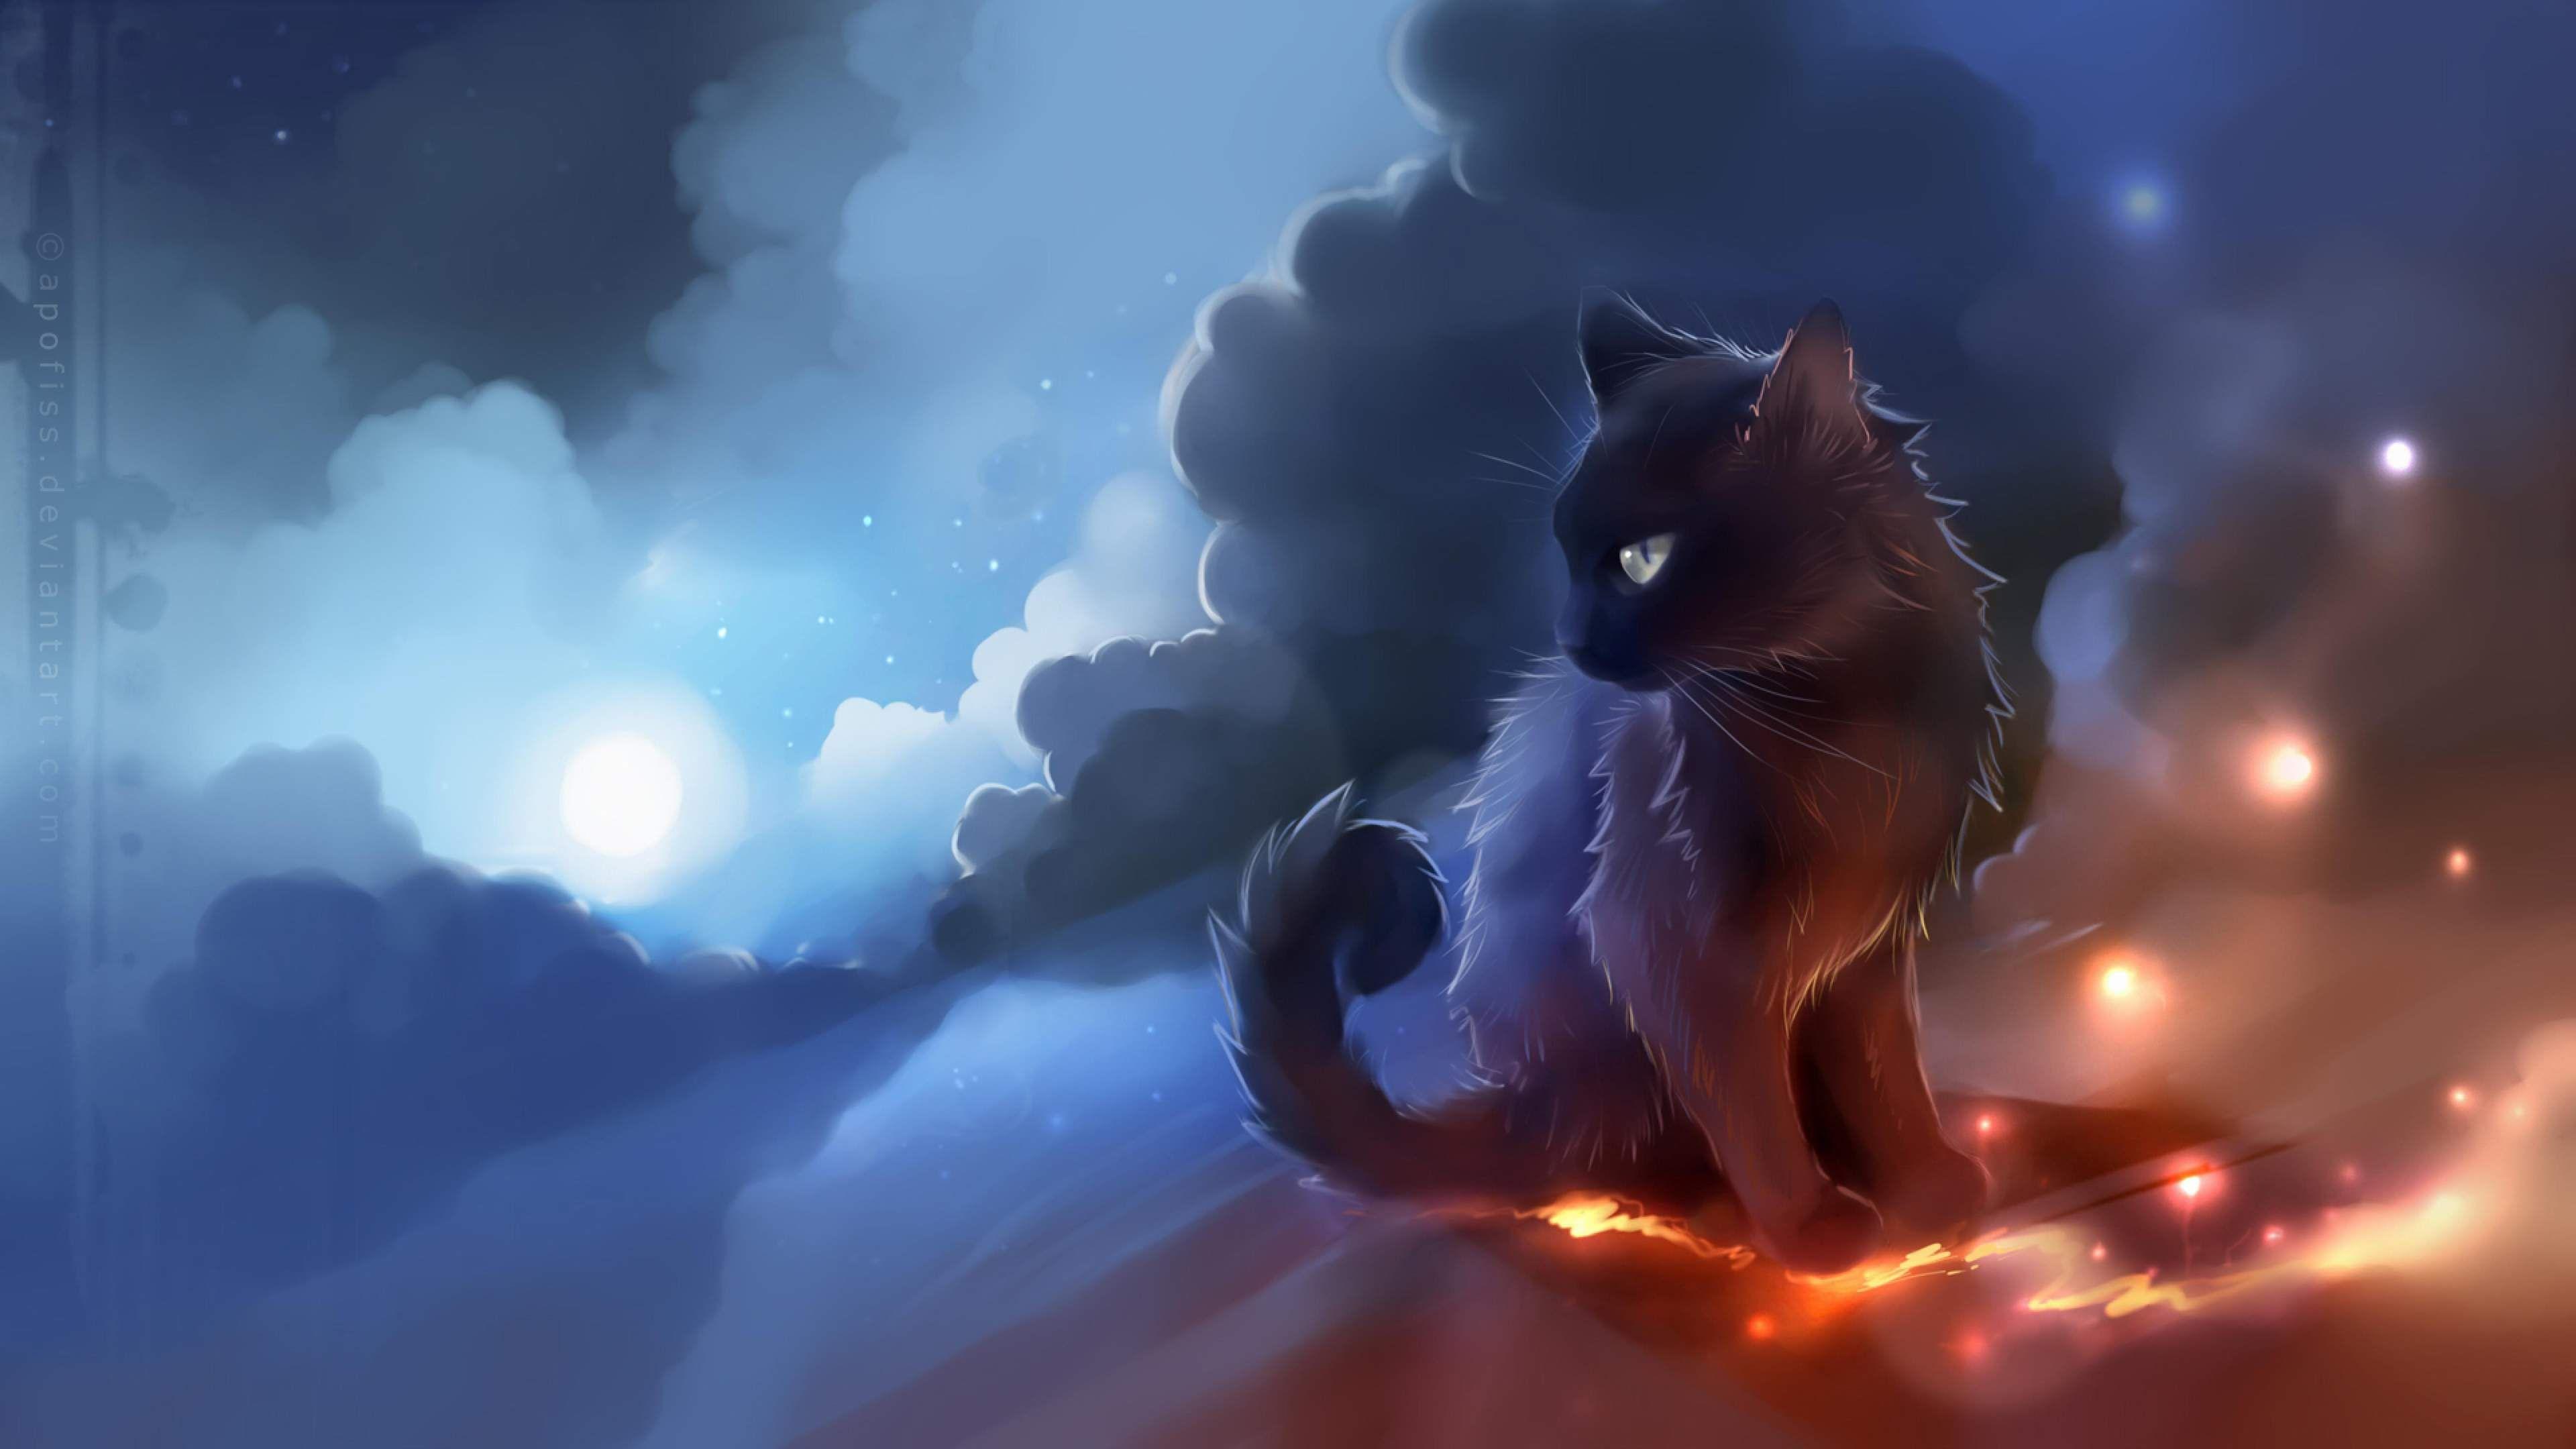 The Black Cat Art Painting 4k Wallpaper Warrior Cat Names